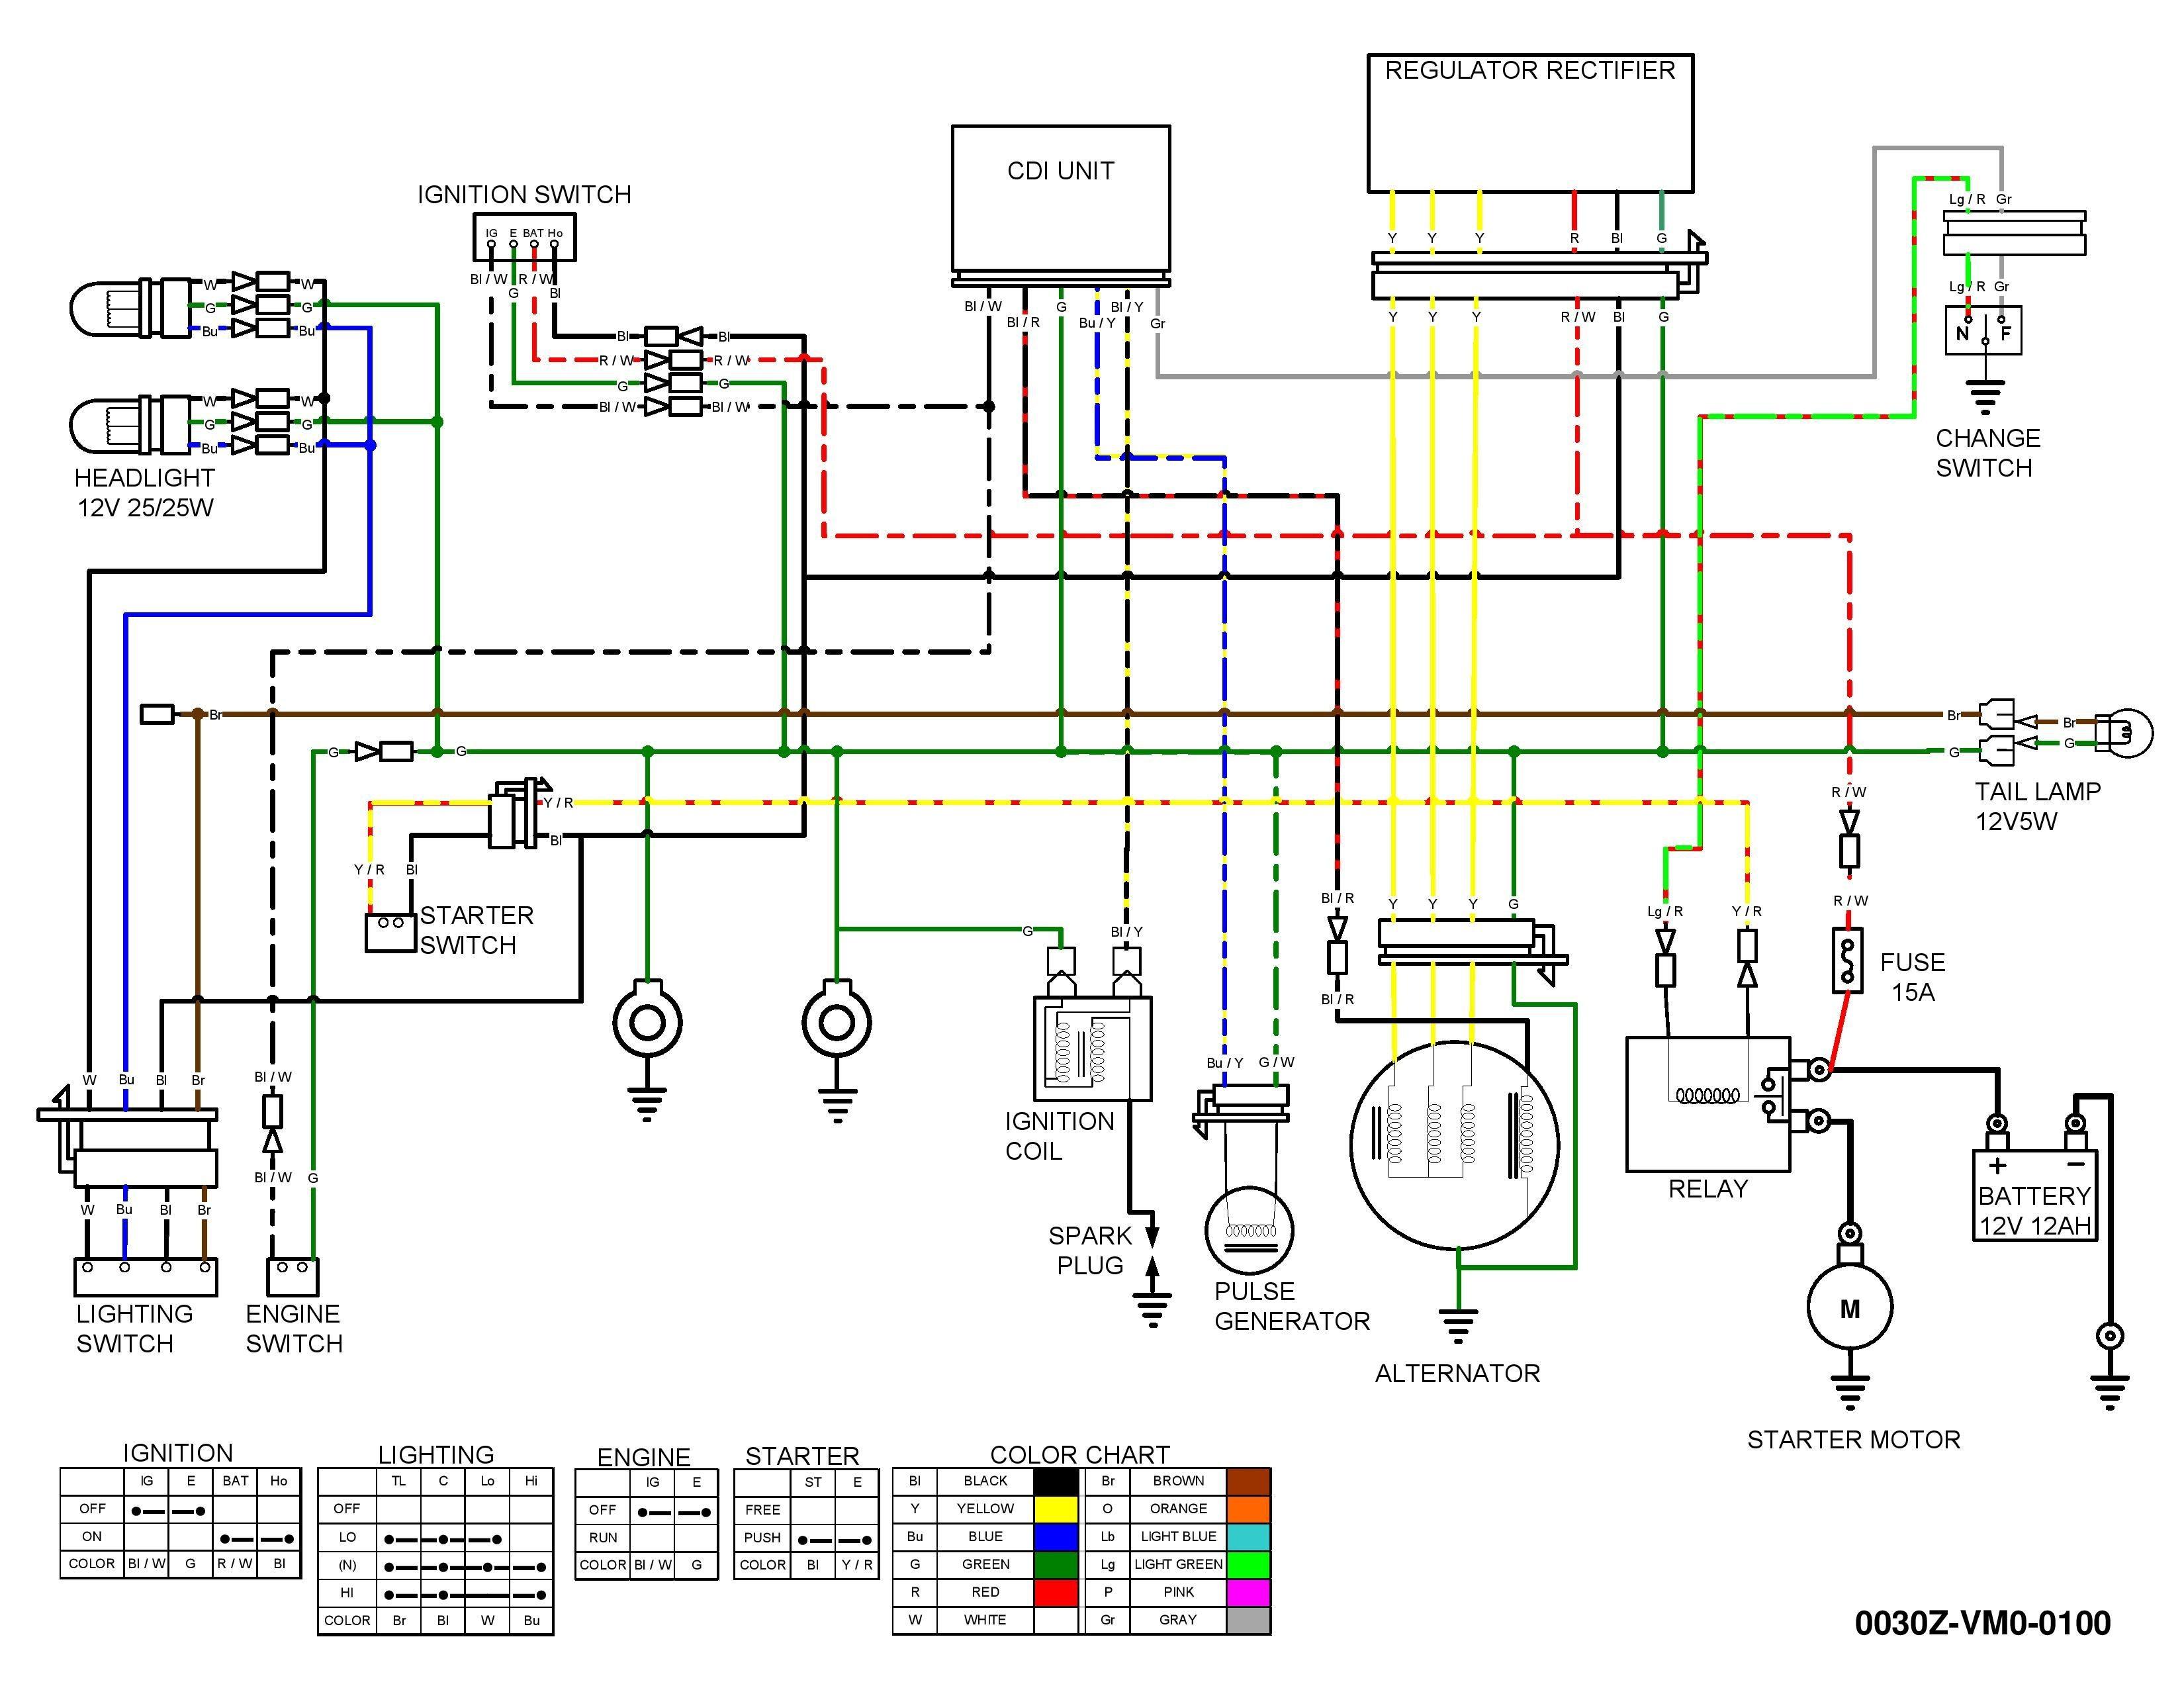 Honda Odyssey Sliding Door Wiring 2003 Honda Odyssey Wiring Diagram Wiring Diagram Motor